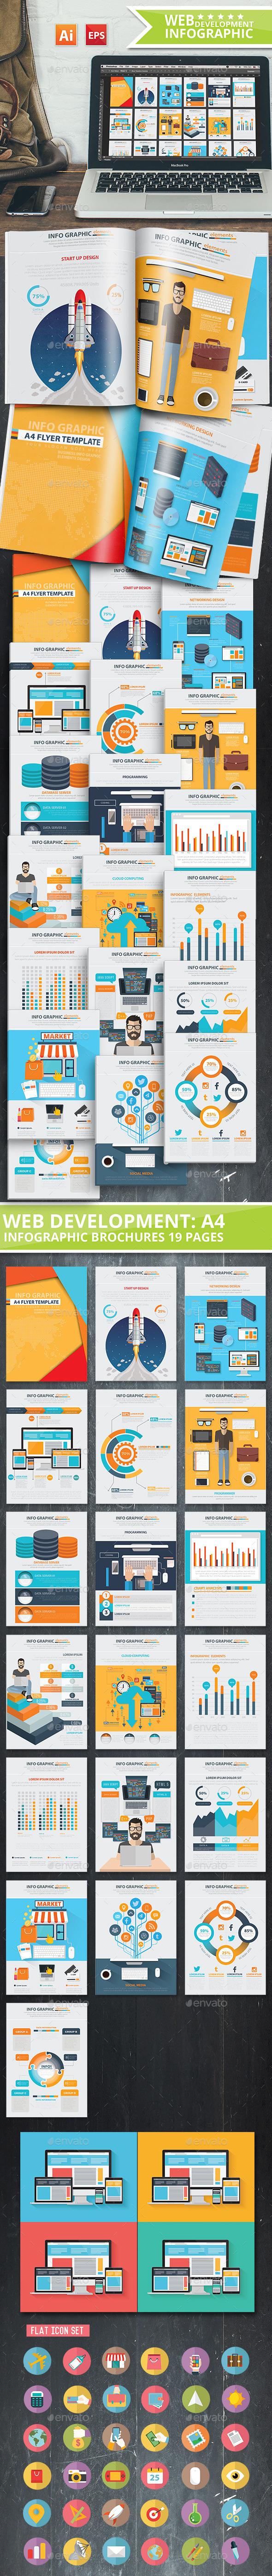 Web Development & SEO Infographics 19 Pages Design - Infographics